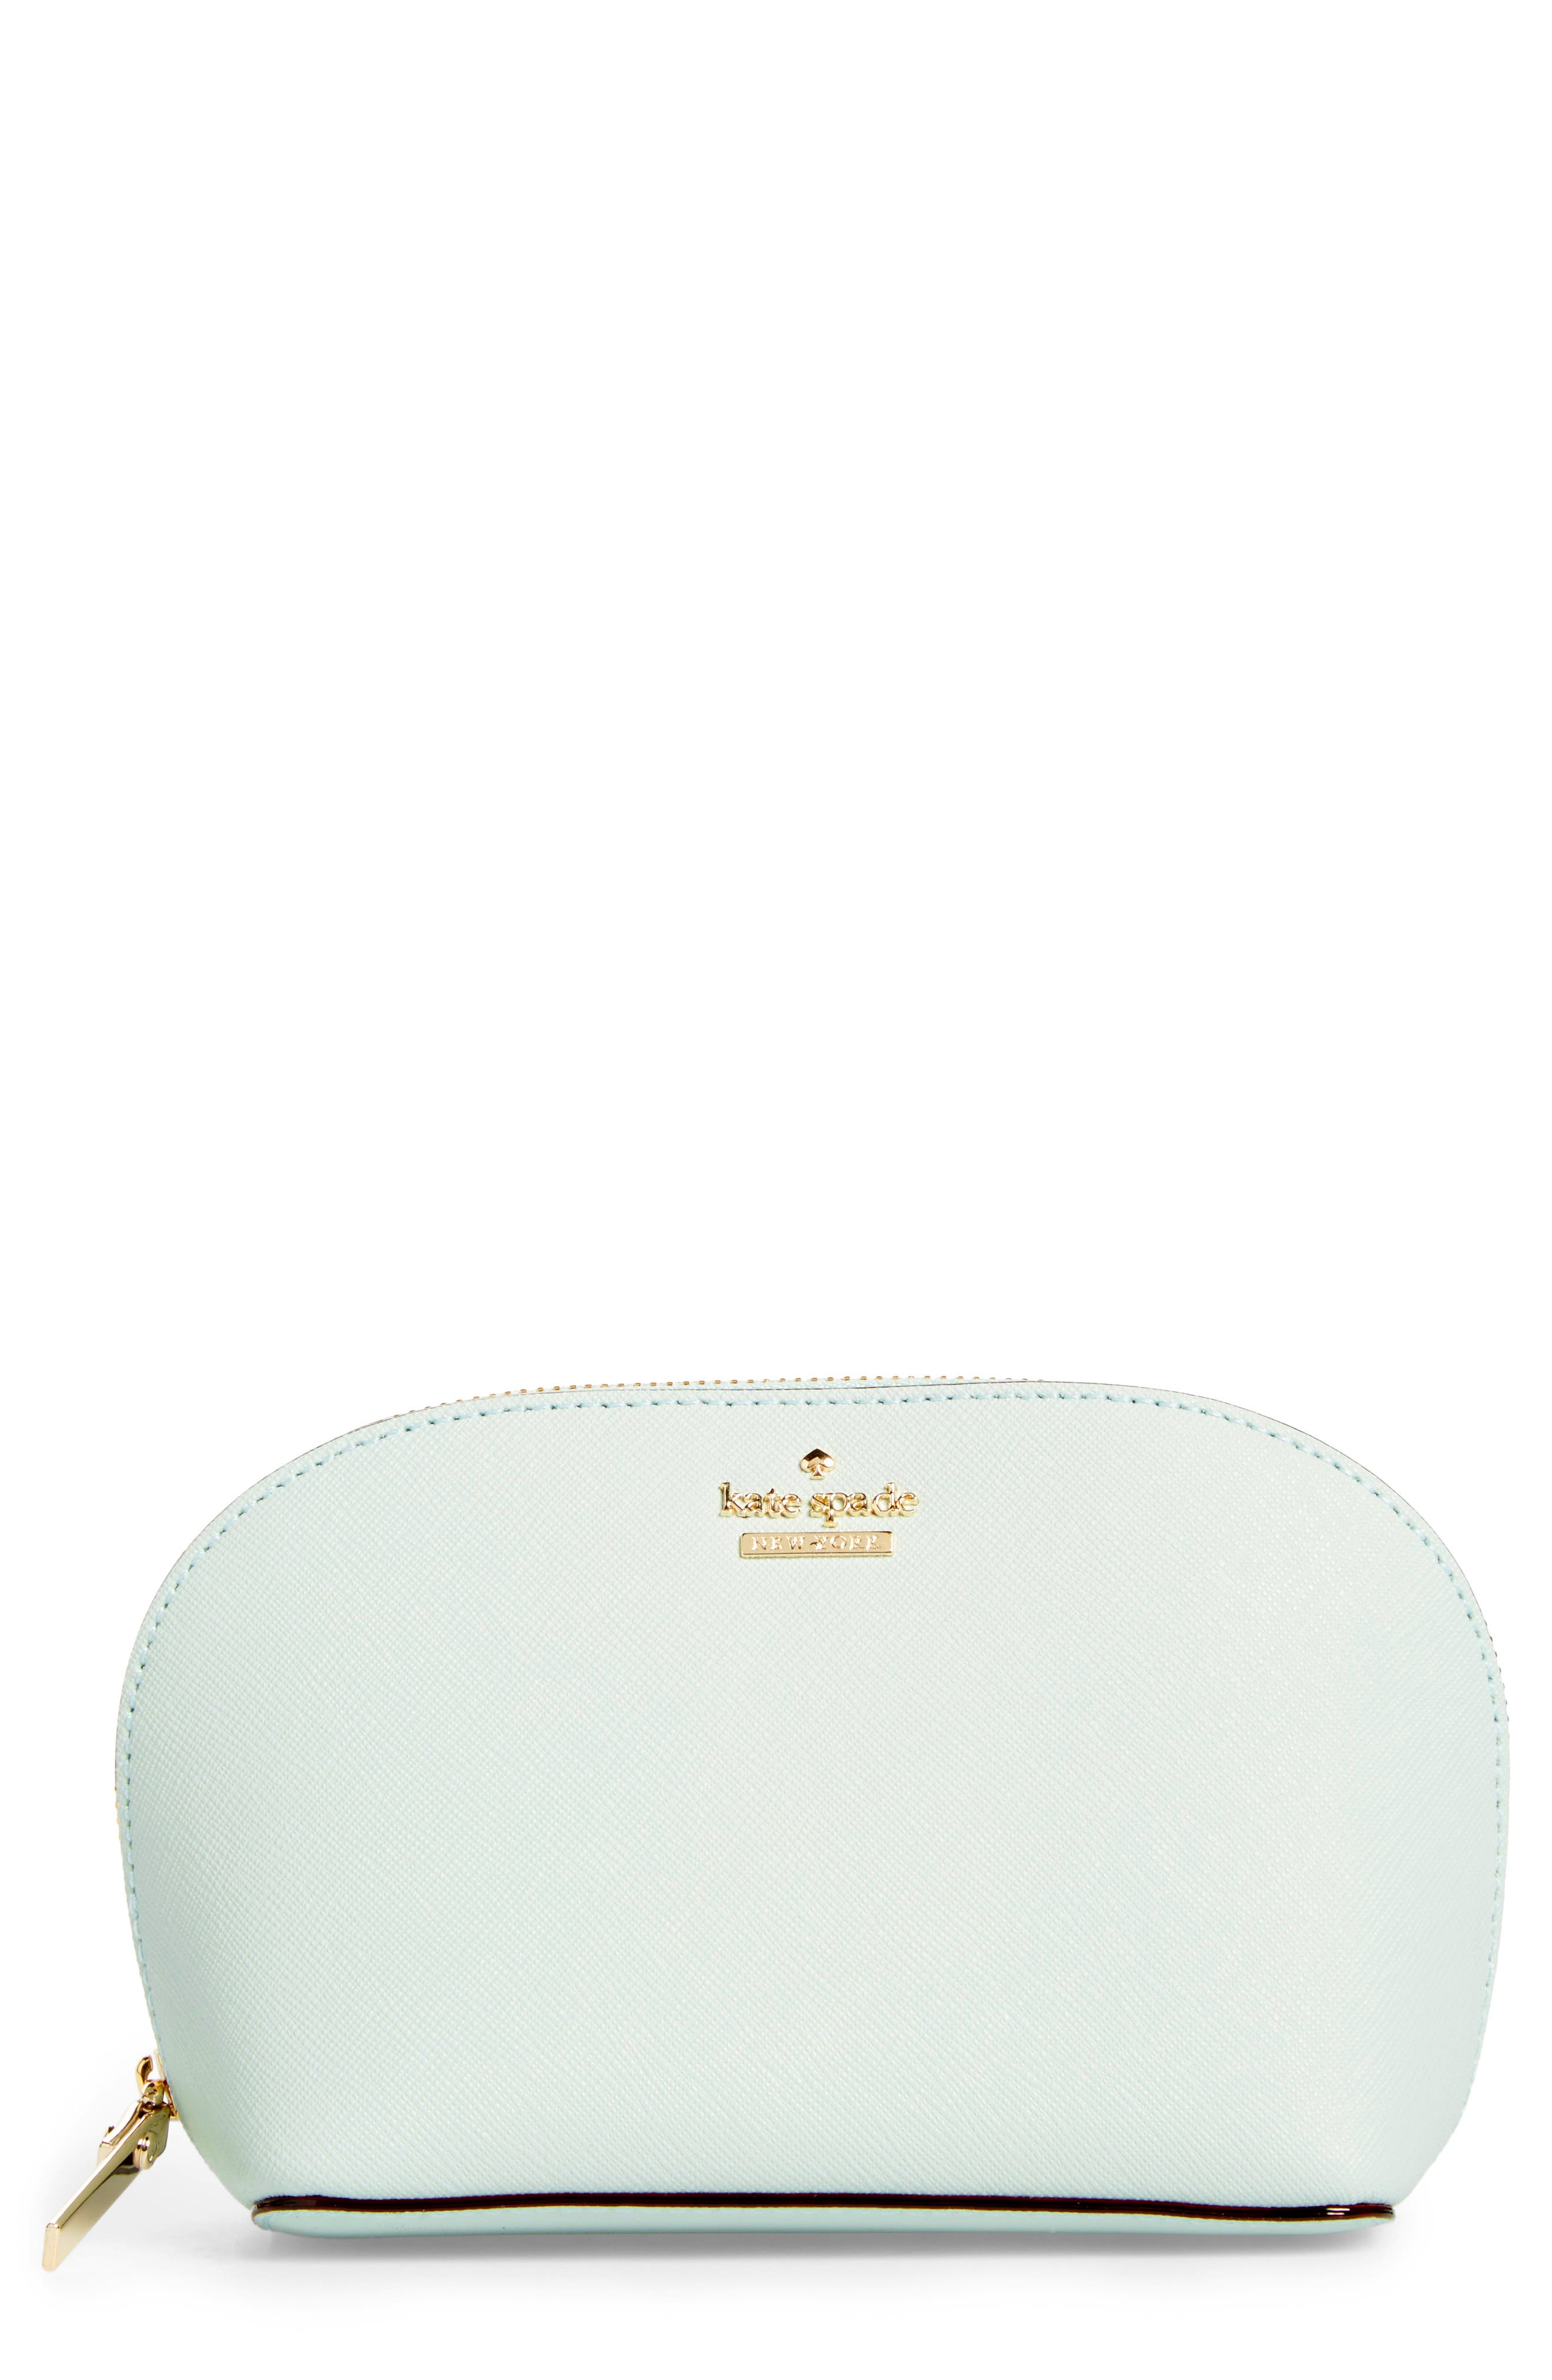 cameron street - small abalene leather cosmetics bag,                             Main thumbnail 1, color,                             Misty Mint